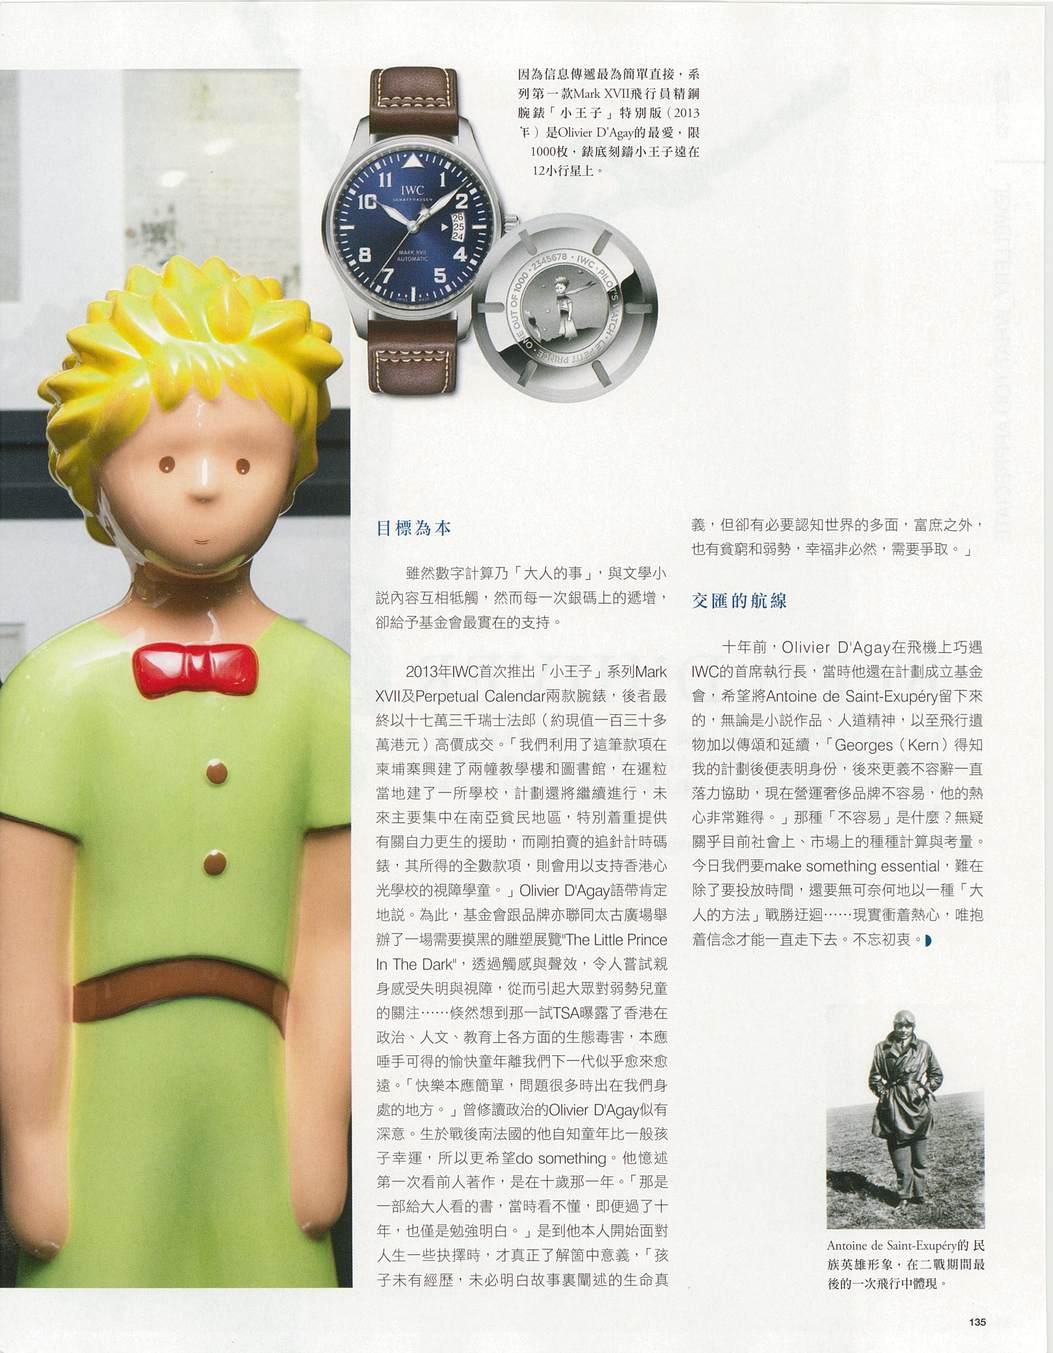 20151219_Ming Pao Weekly_M134-135_2_201512199978955.JPG